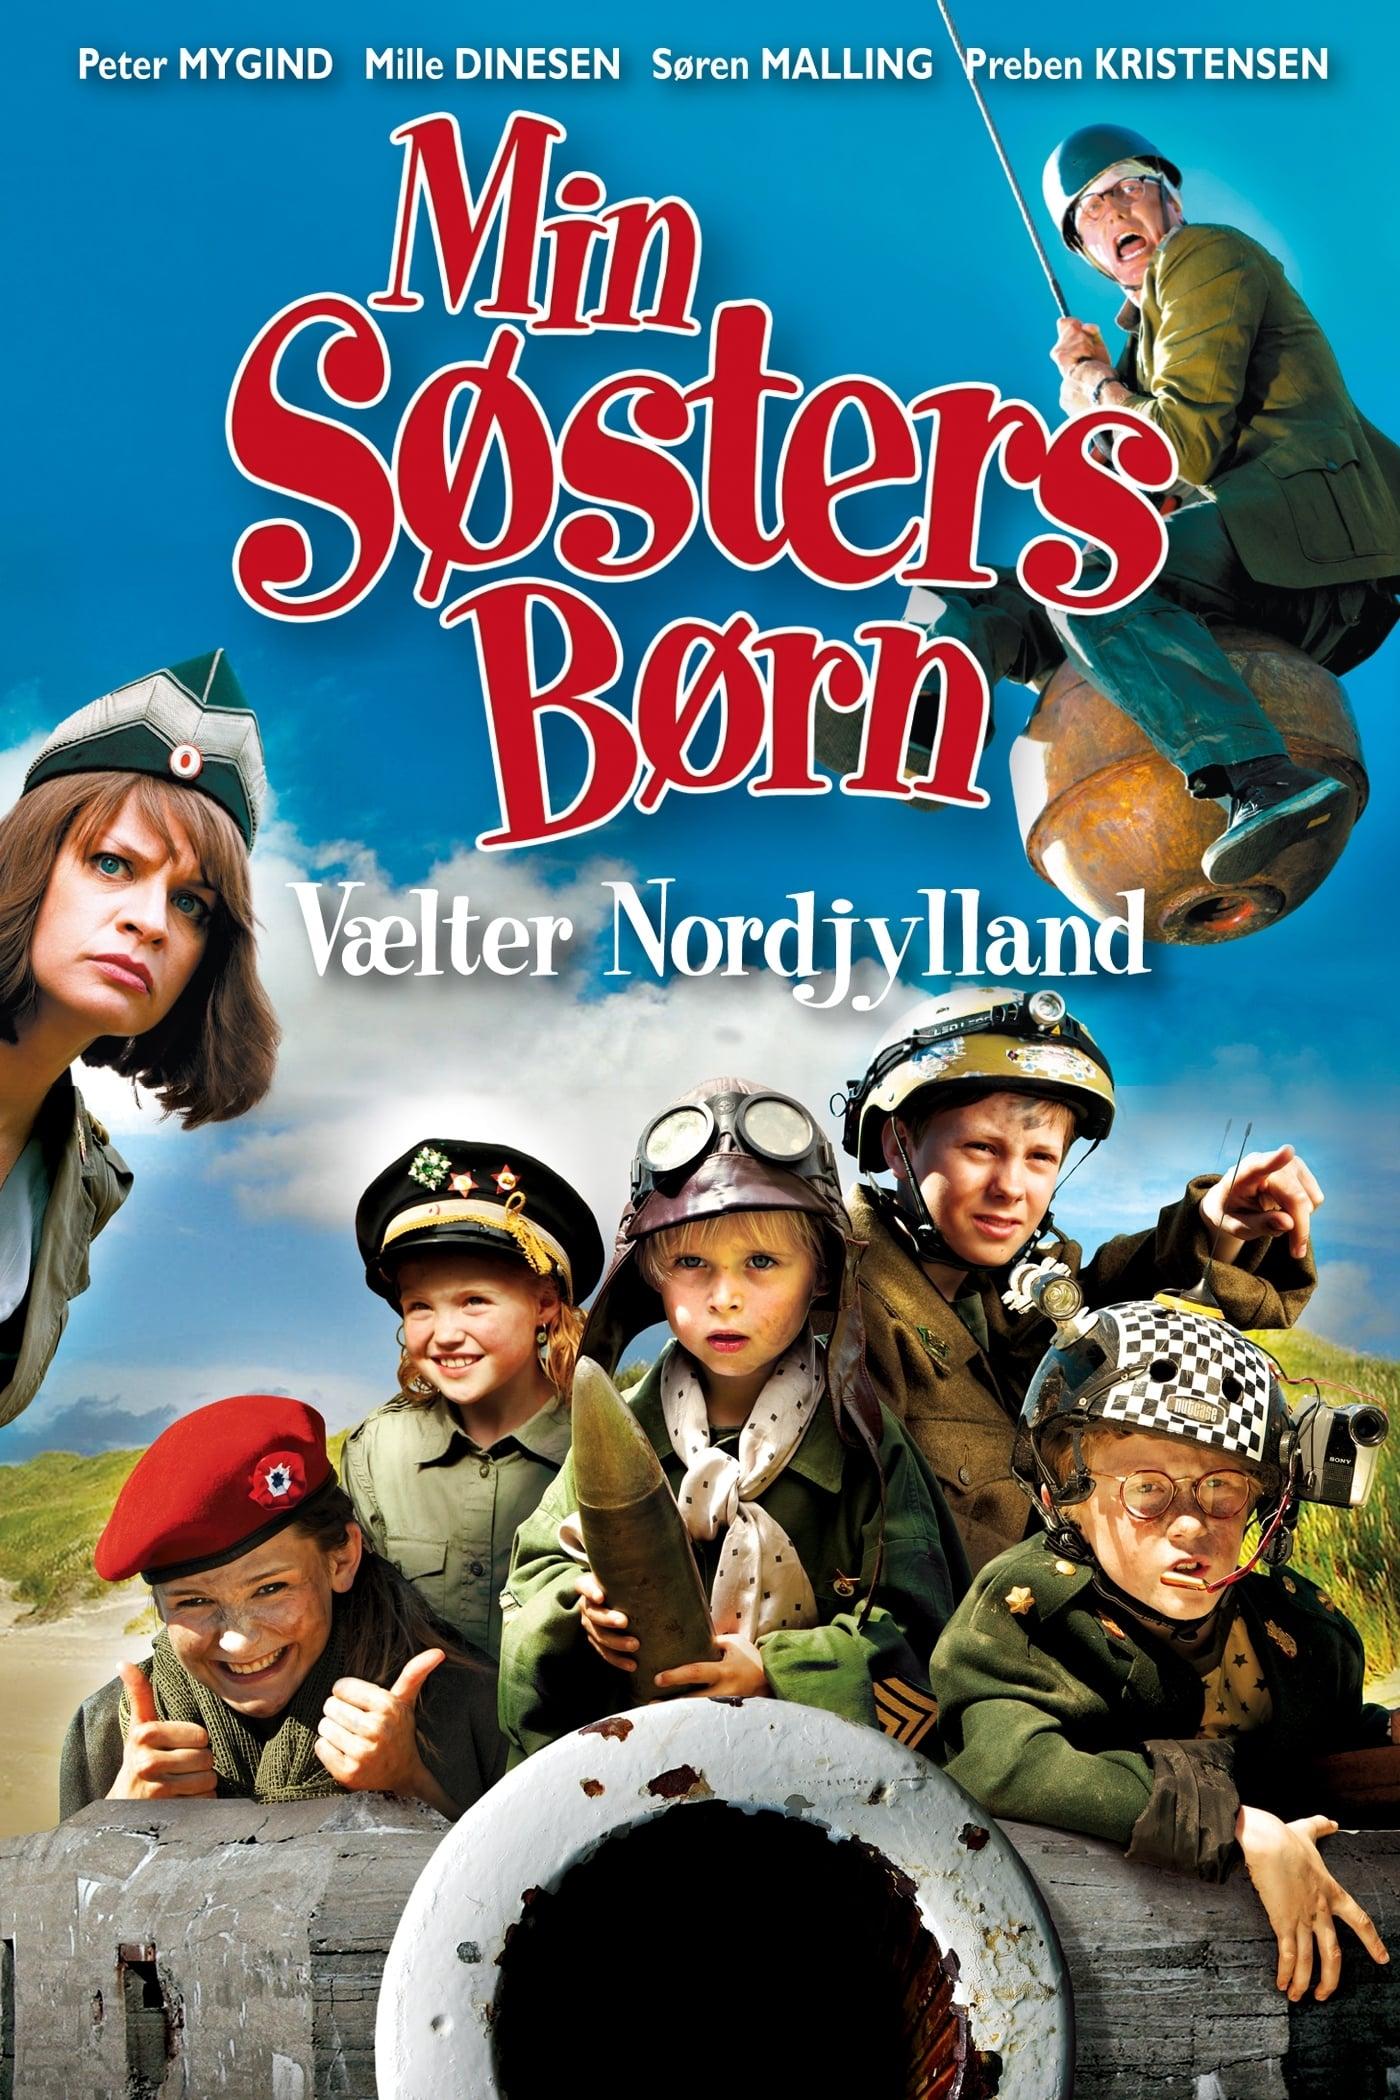 My Sister's Kids in Jutland (2010)